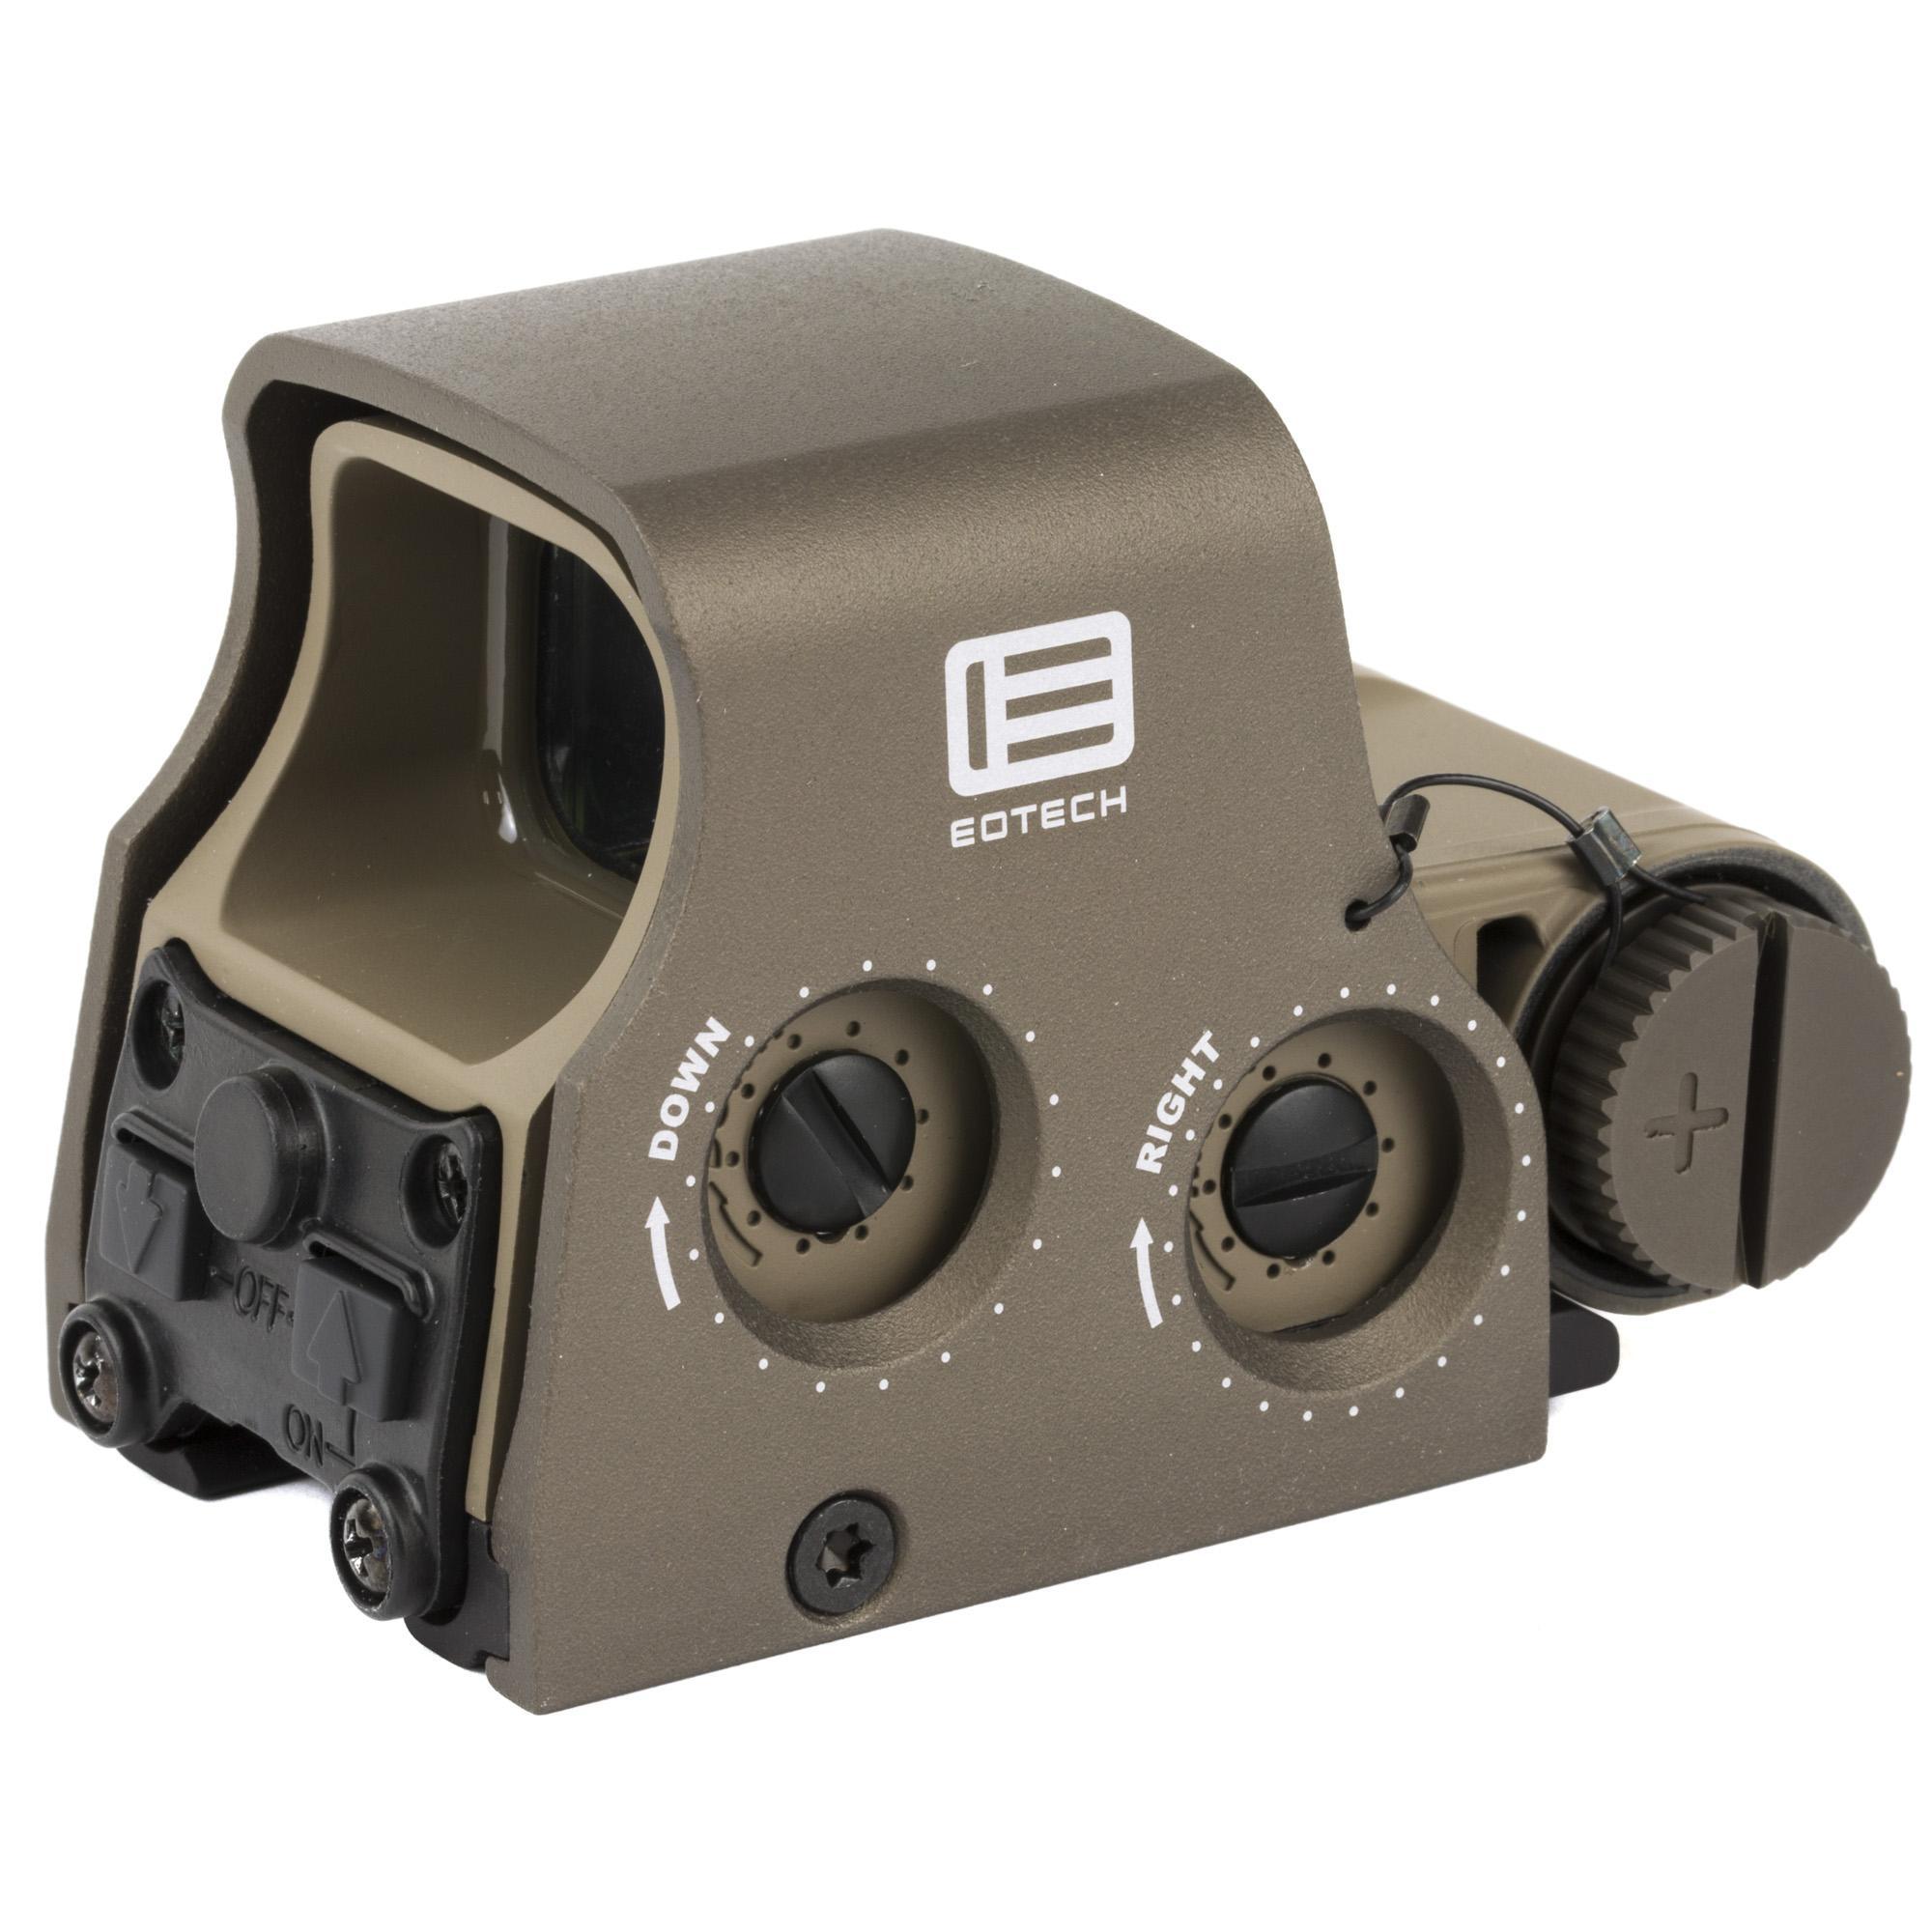 EOTech Eotech Xps2-0 68/1 Moa Cr123 Tan